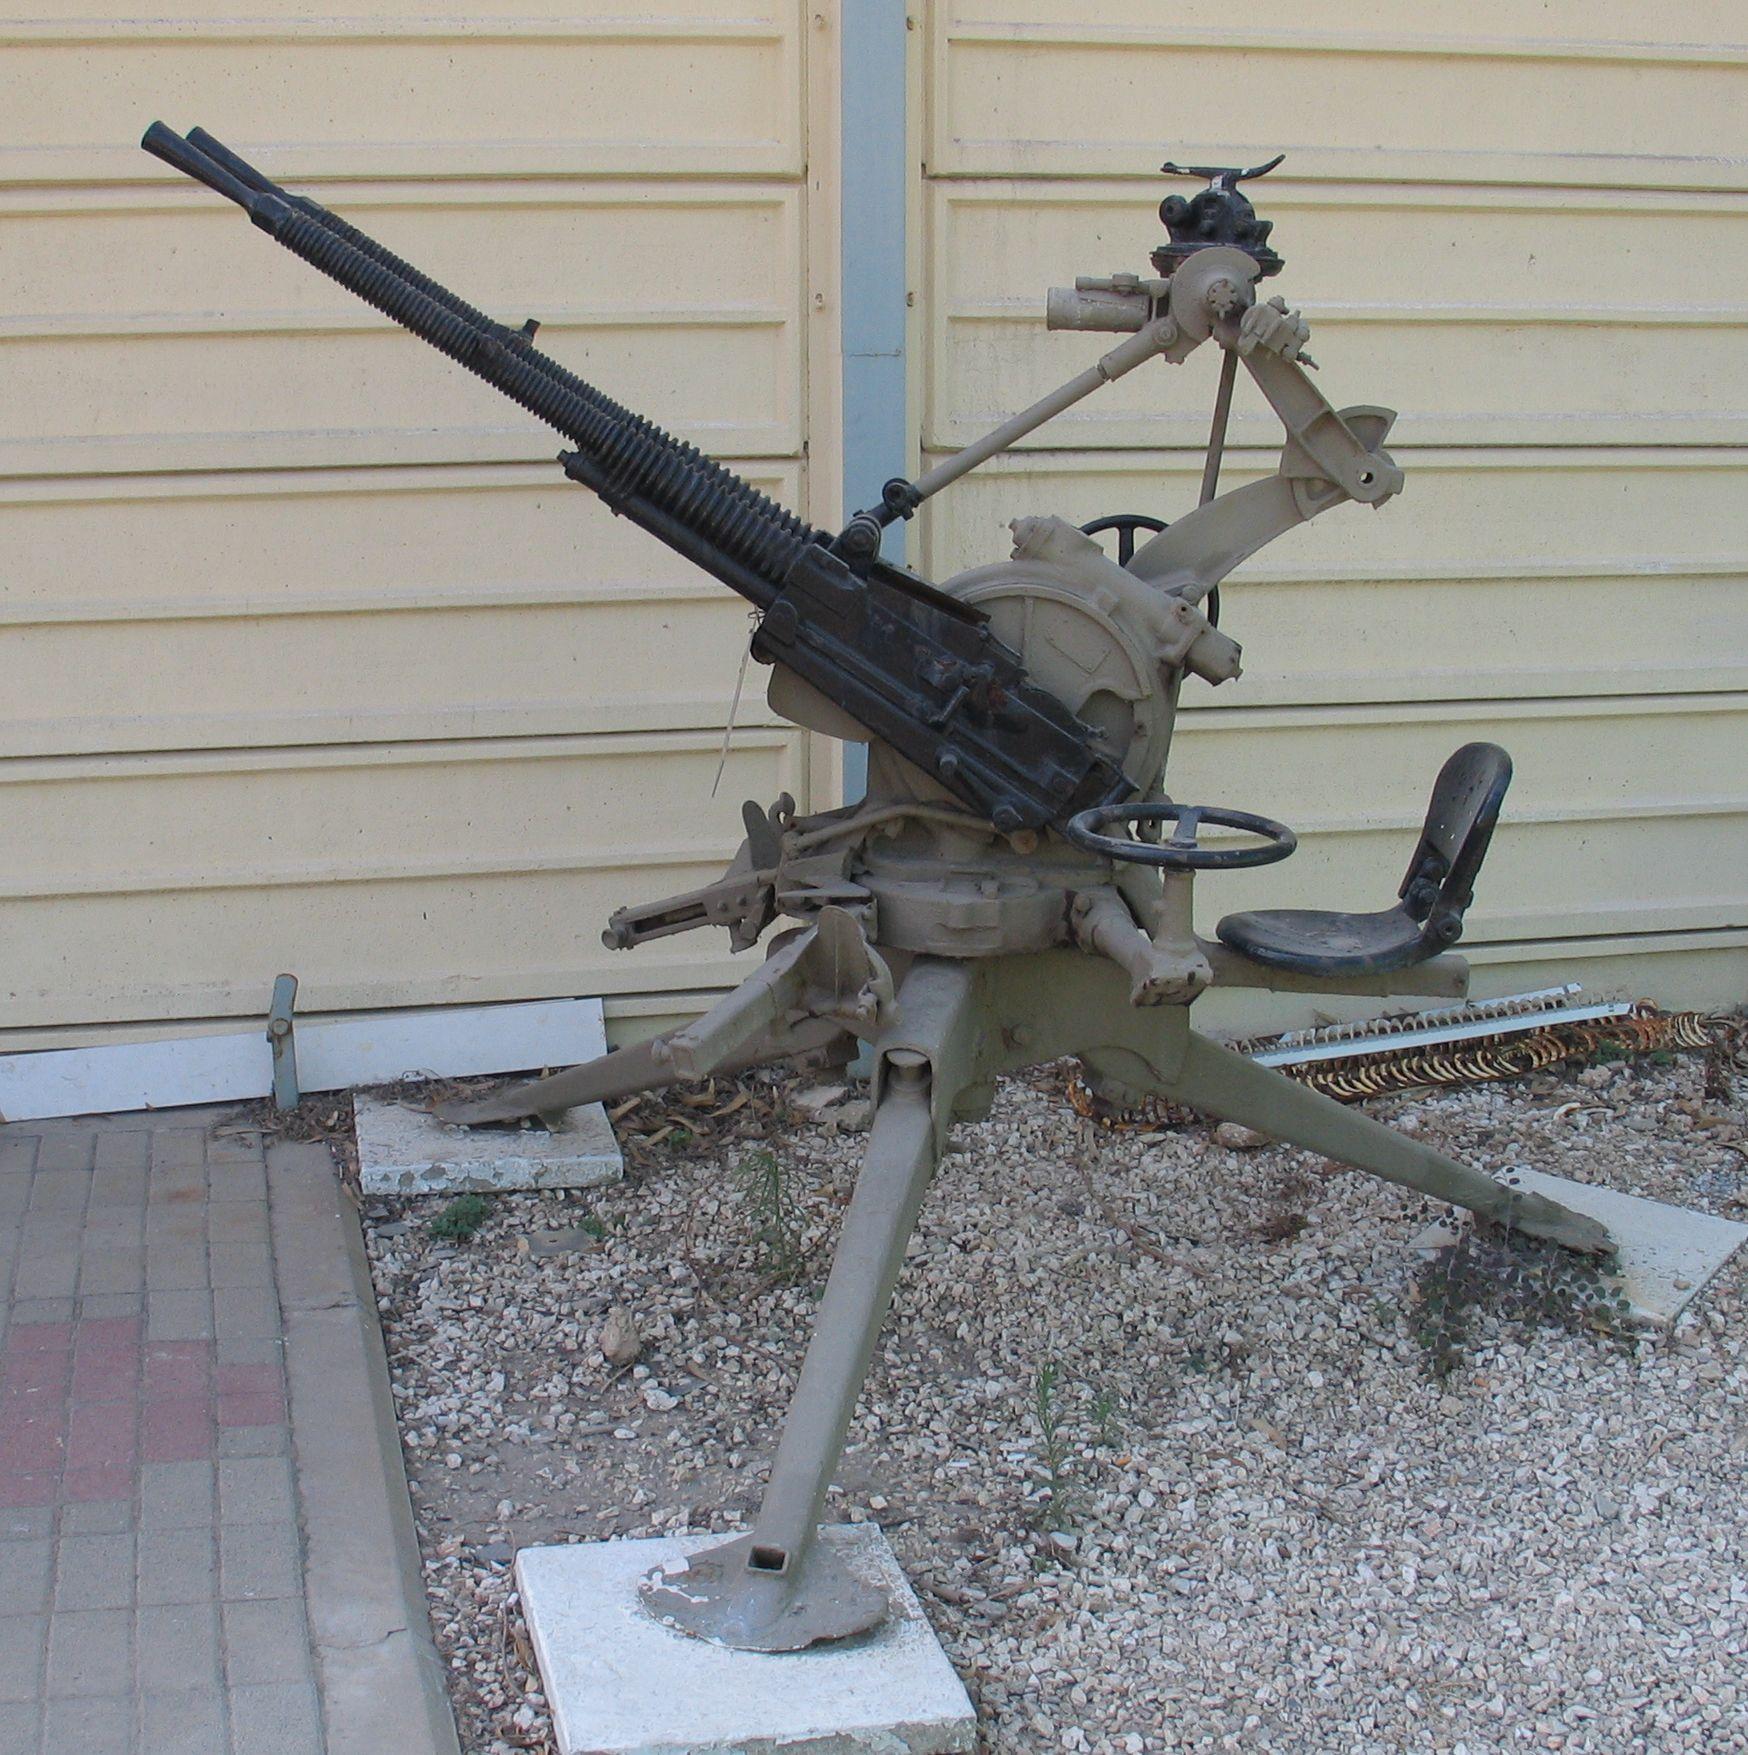 Ametralladora Hotchkiss 13,2 mm Hotchkiss-13.2mm-x2-AA-machine-gun-batey-haosef-2-1